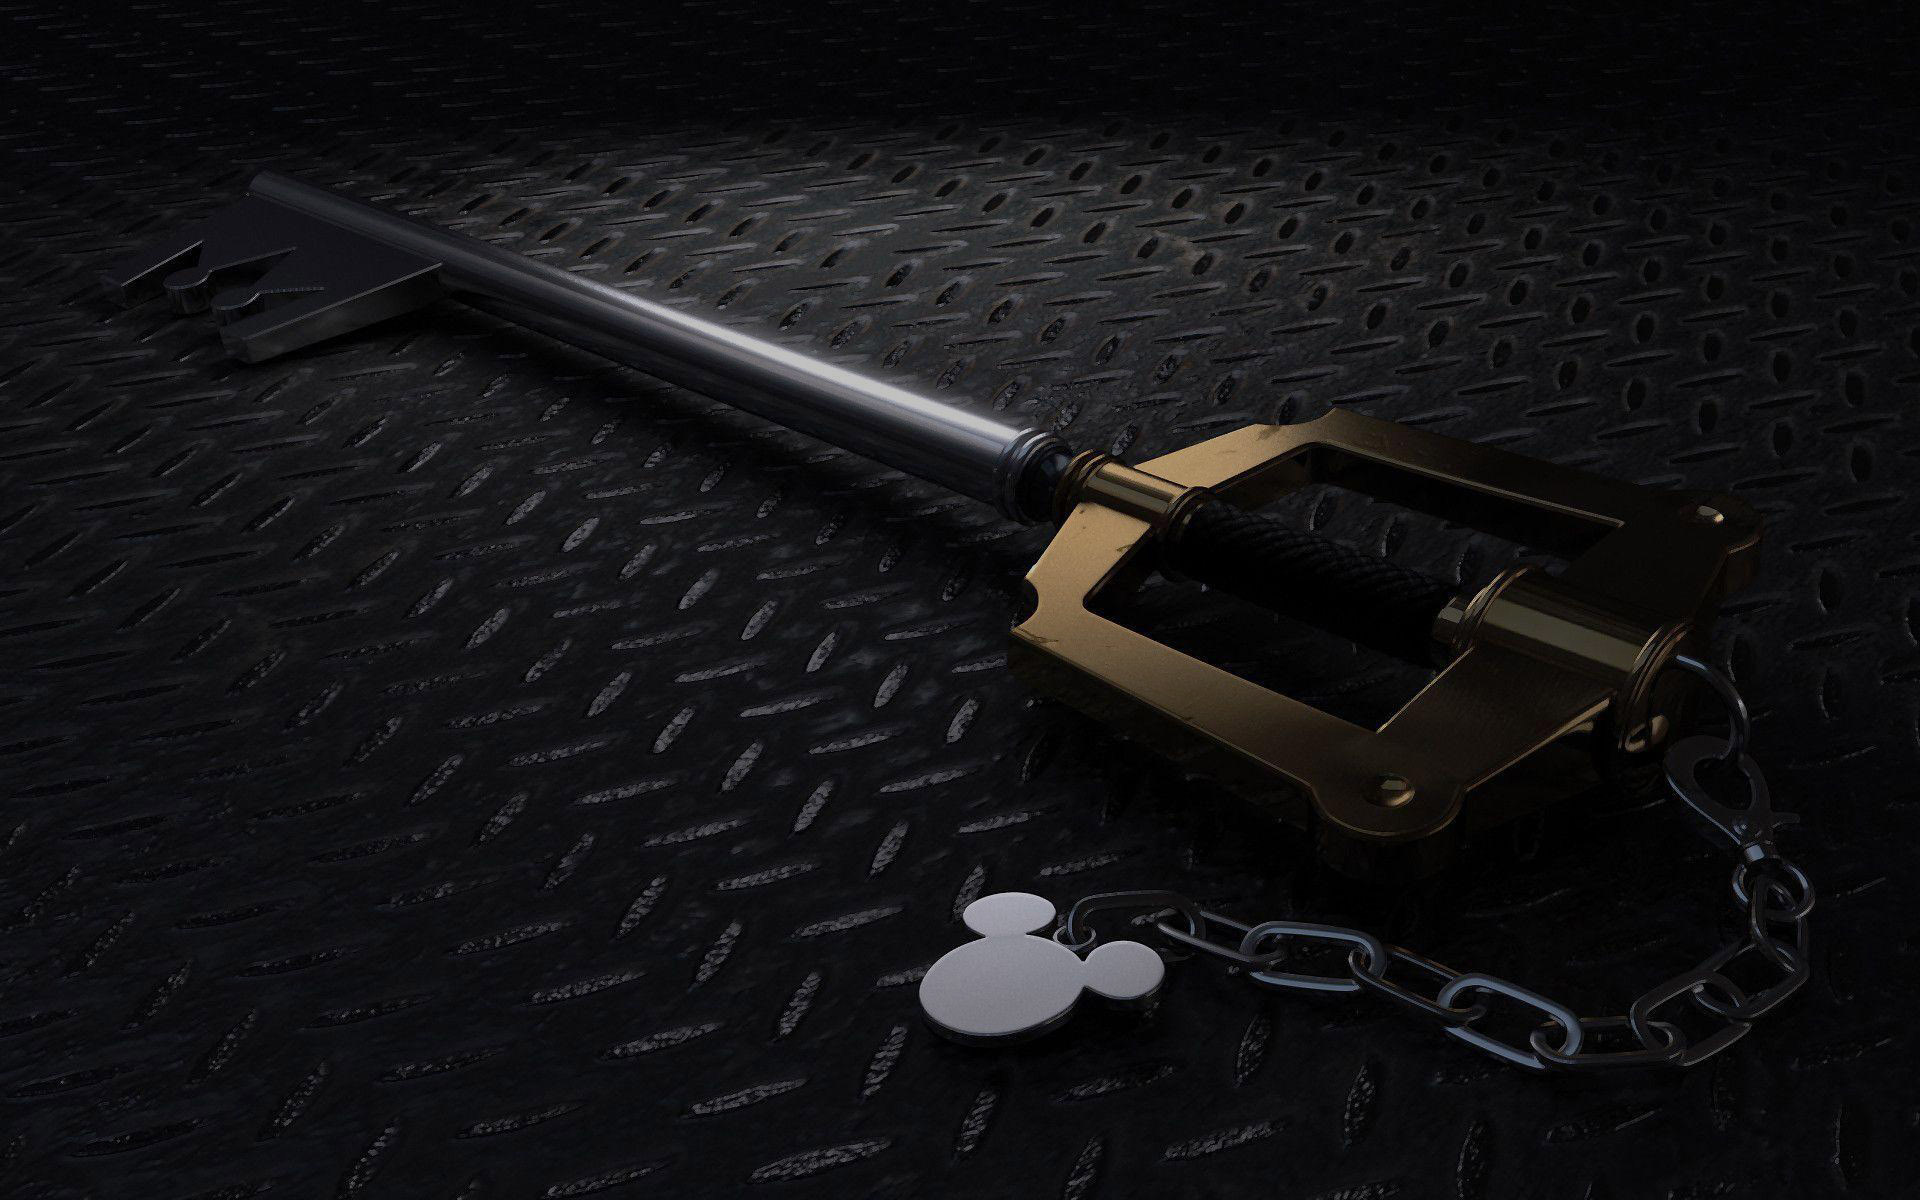 Kingdom Hearts Timeline: la cronologia di KH